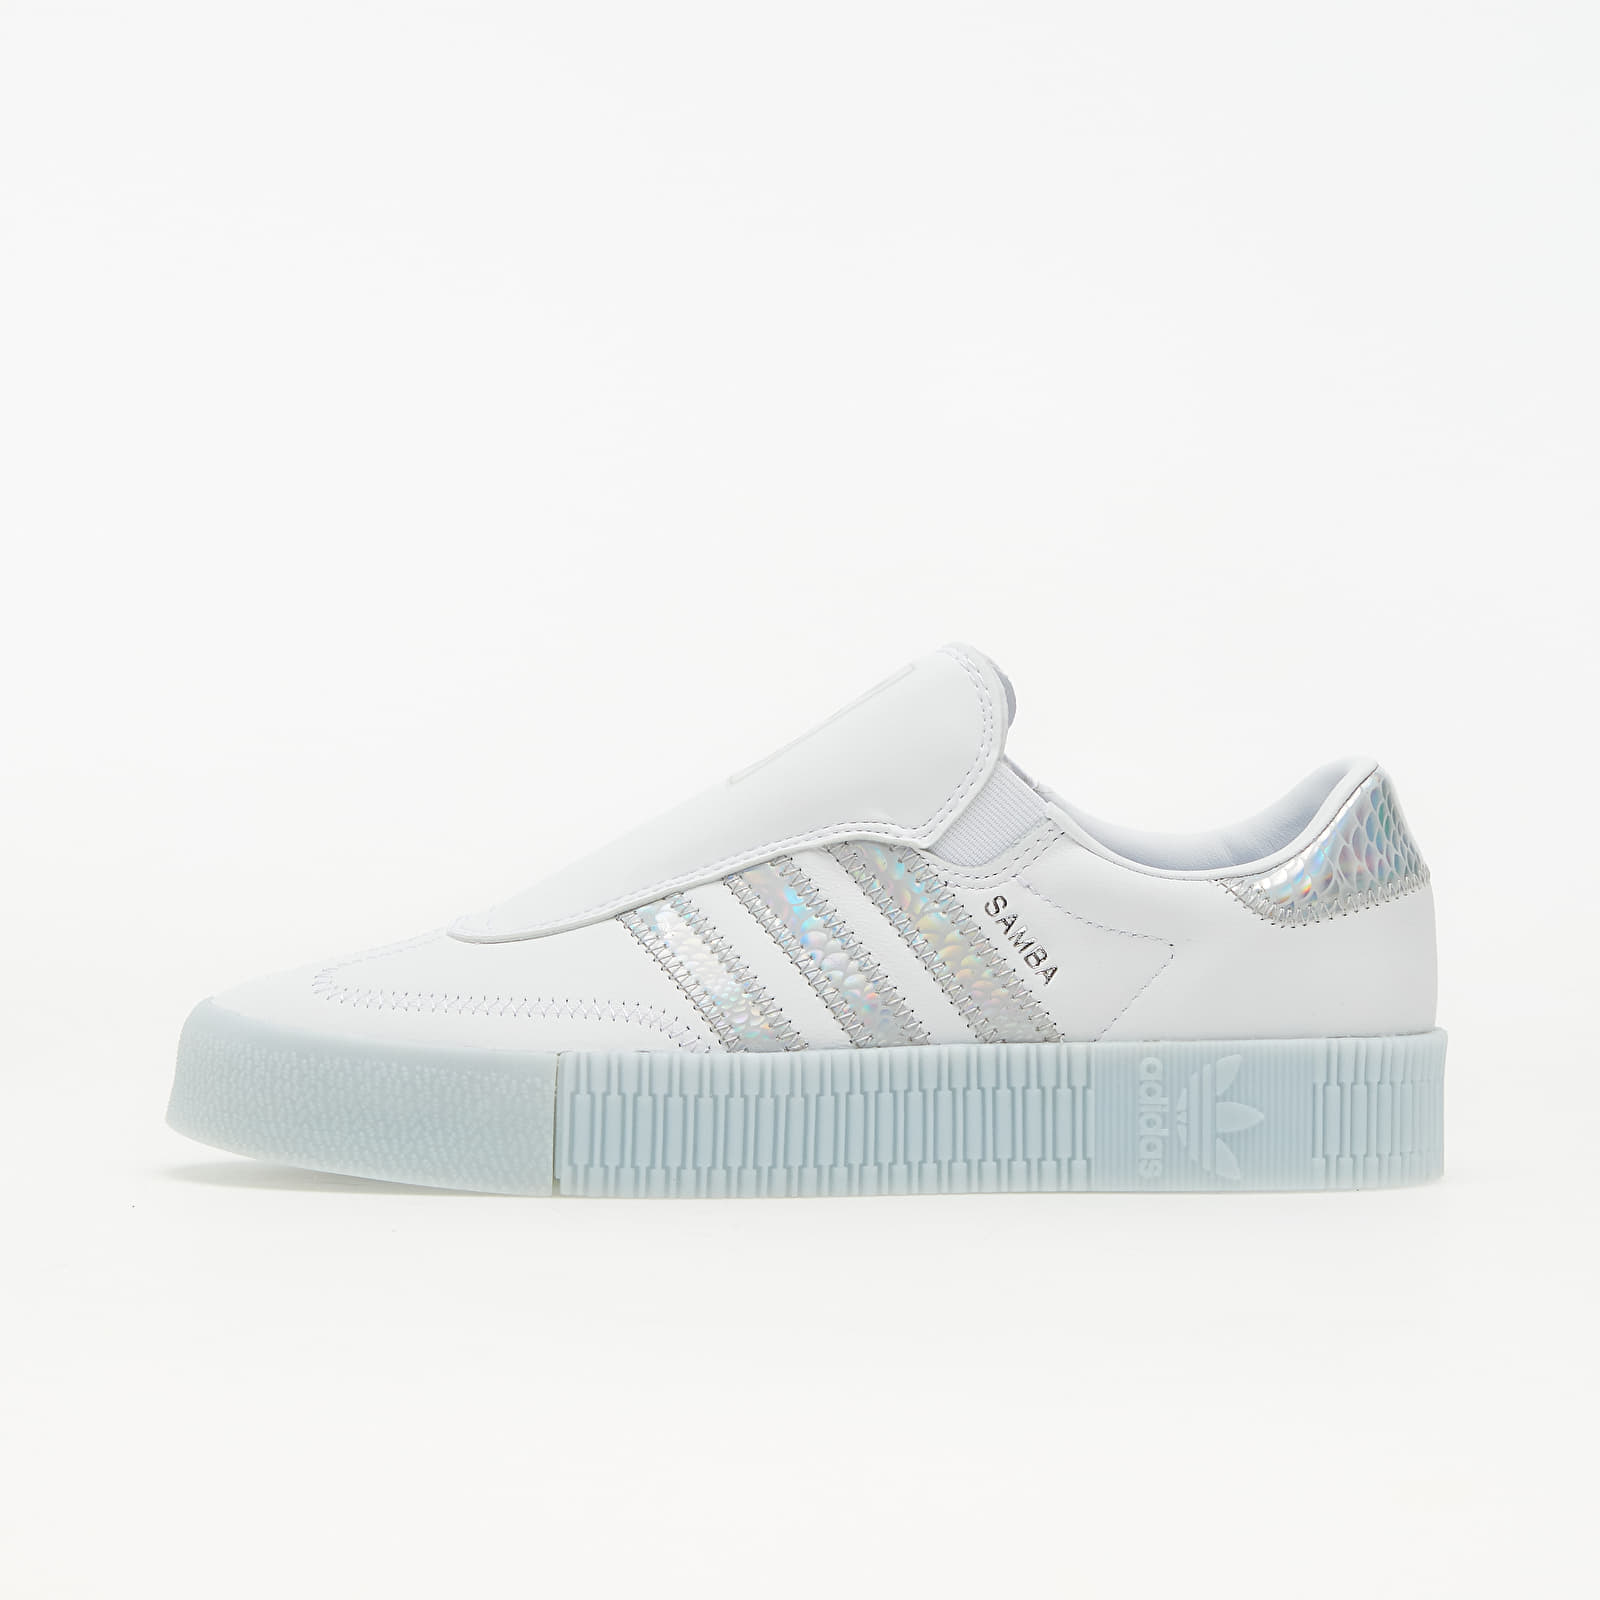 adidas Sambarose Eazy W Ftw White/ Supplier Color/ Halo Blue G55551